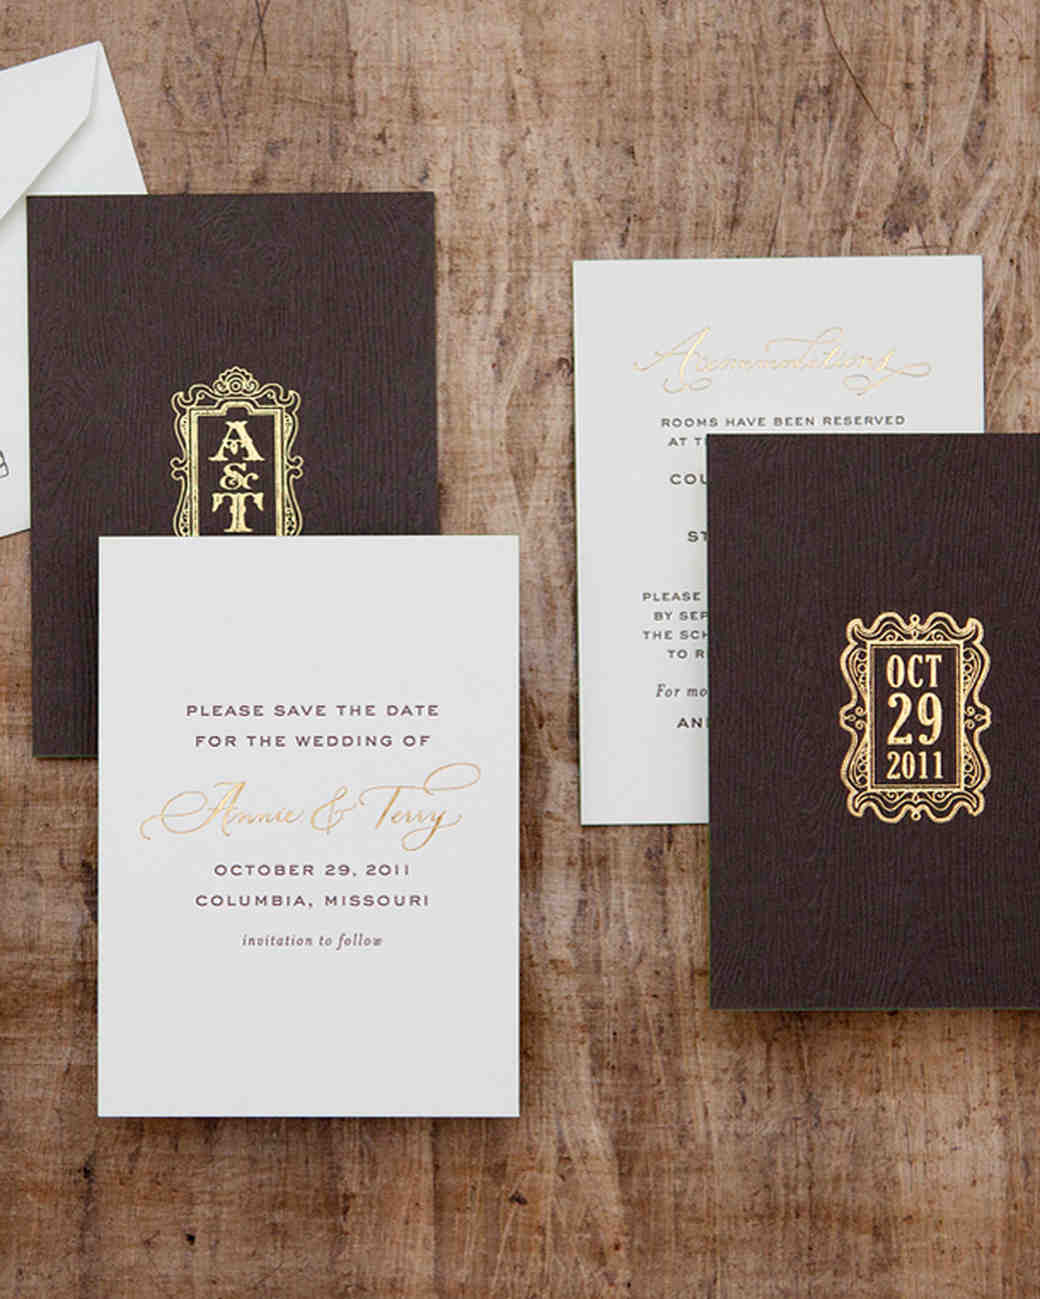 30 DIY SavetheDates to Kick Off Your Wedding – Save the Date Wedding Photos